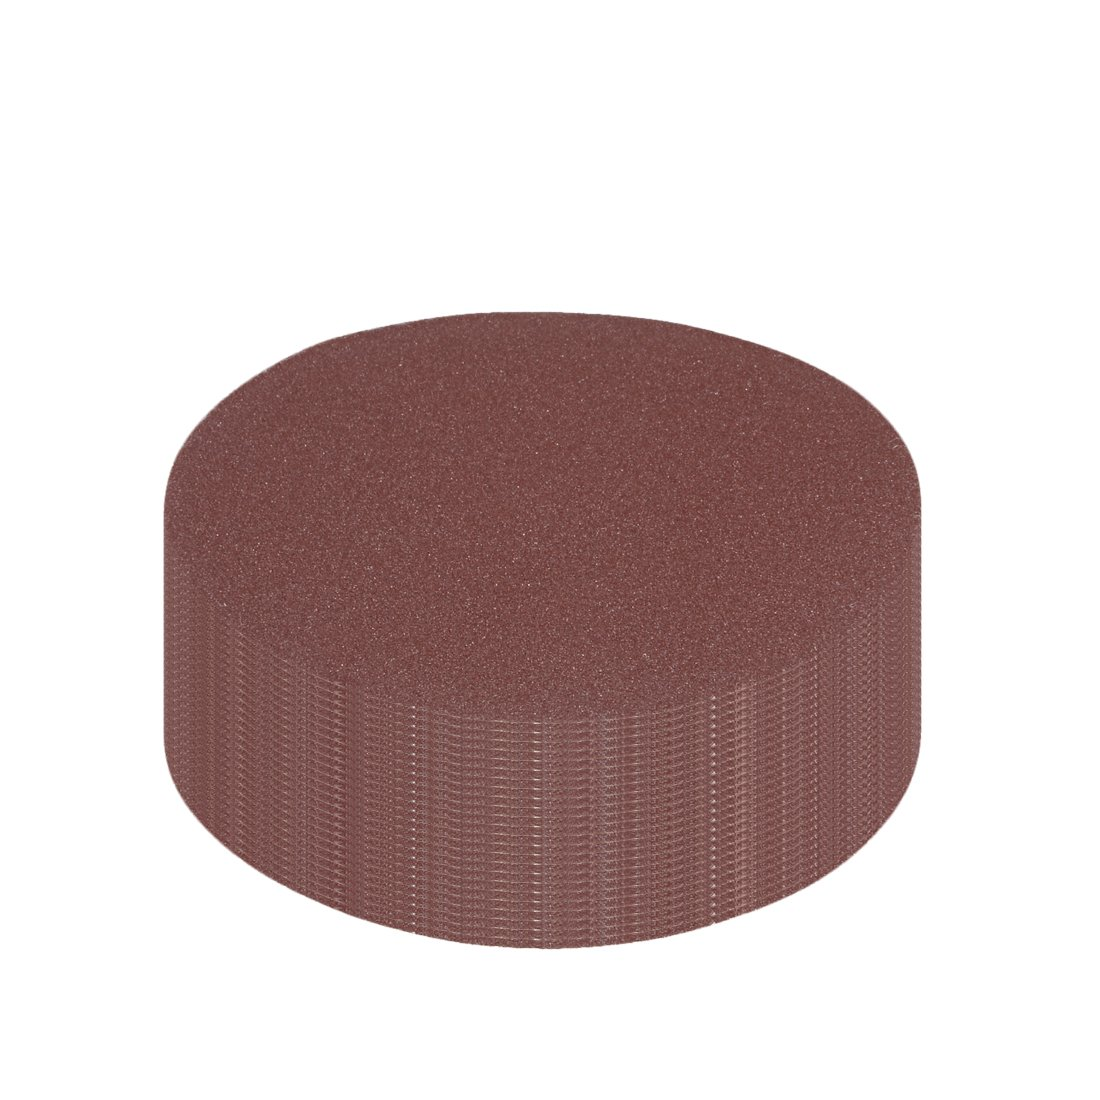 uxcell/® 10Pcs 4 inch Hook and Loop Sanding Disc 3000 Grits Flocking Sandpaper for Random Orbit Sander Gray